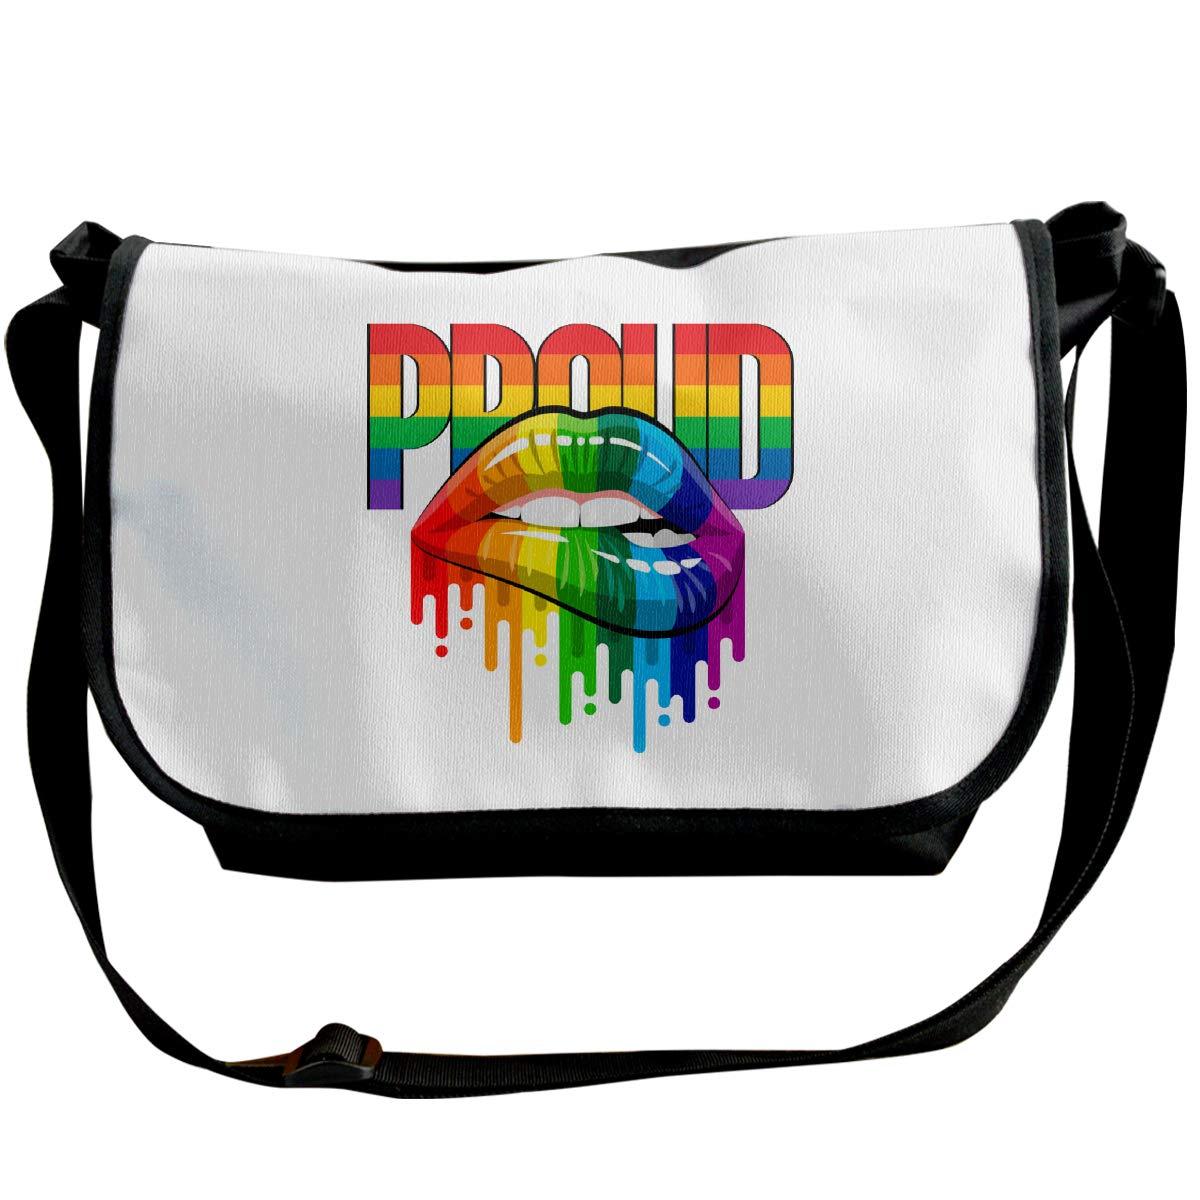 Futong Huaxia Gay Rainbow Lips Pride Travel Messenger Bags Handbag Shoulder Bag Crossbody Bag Unisex